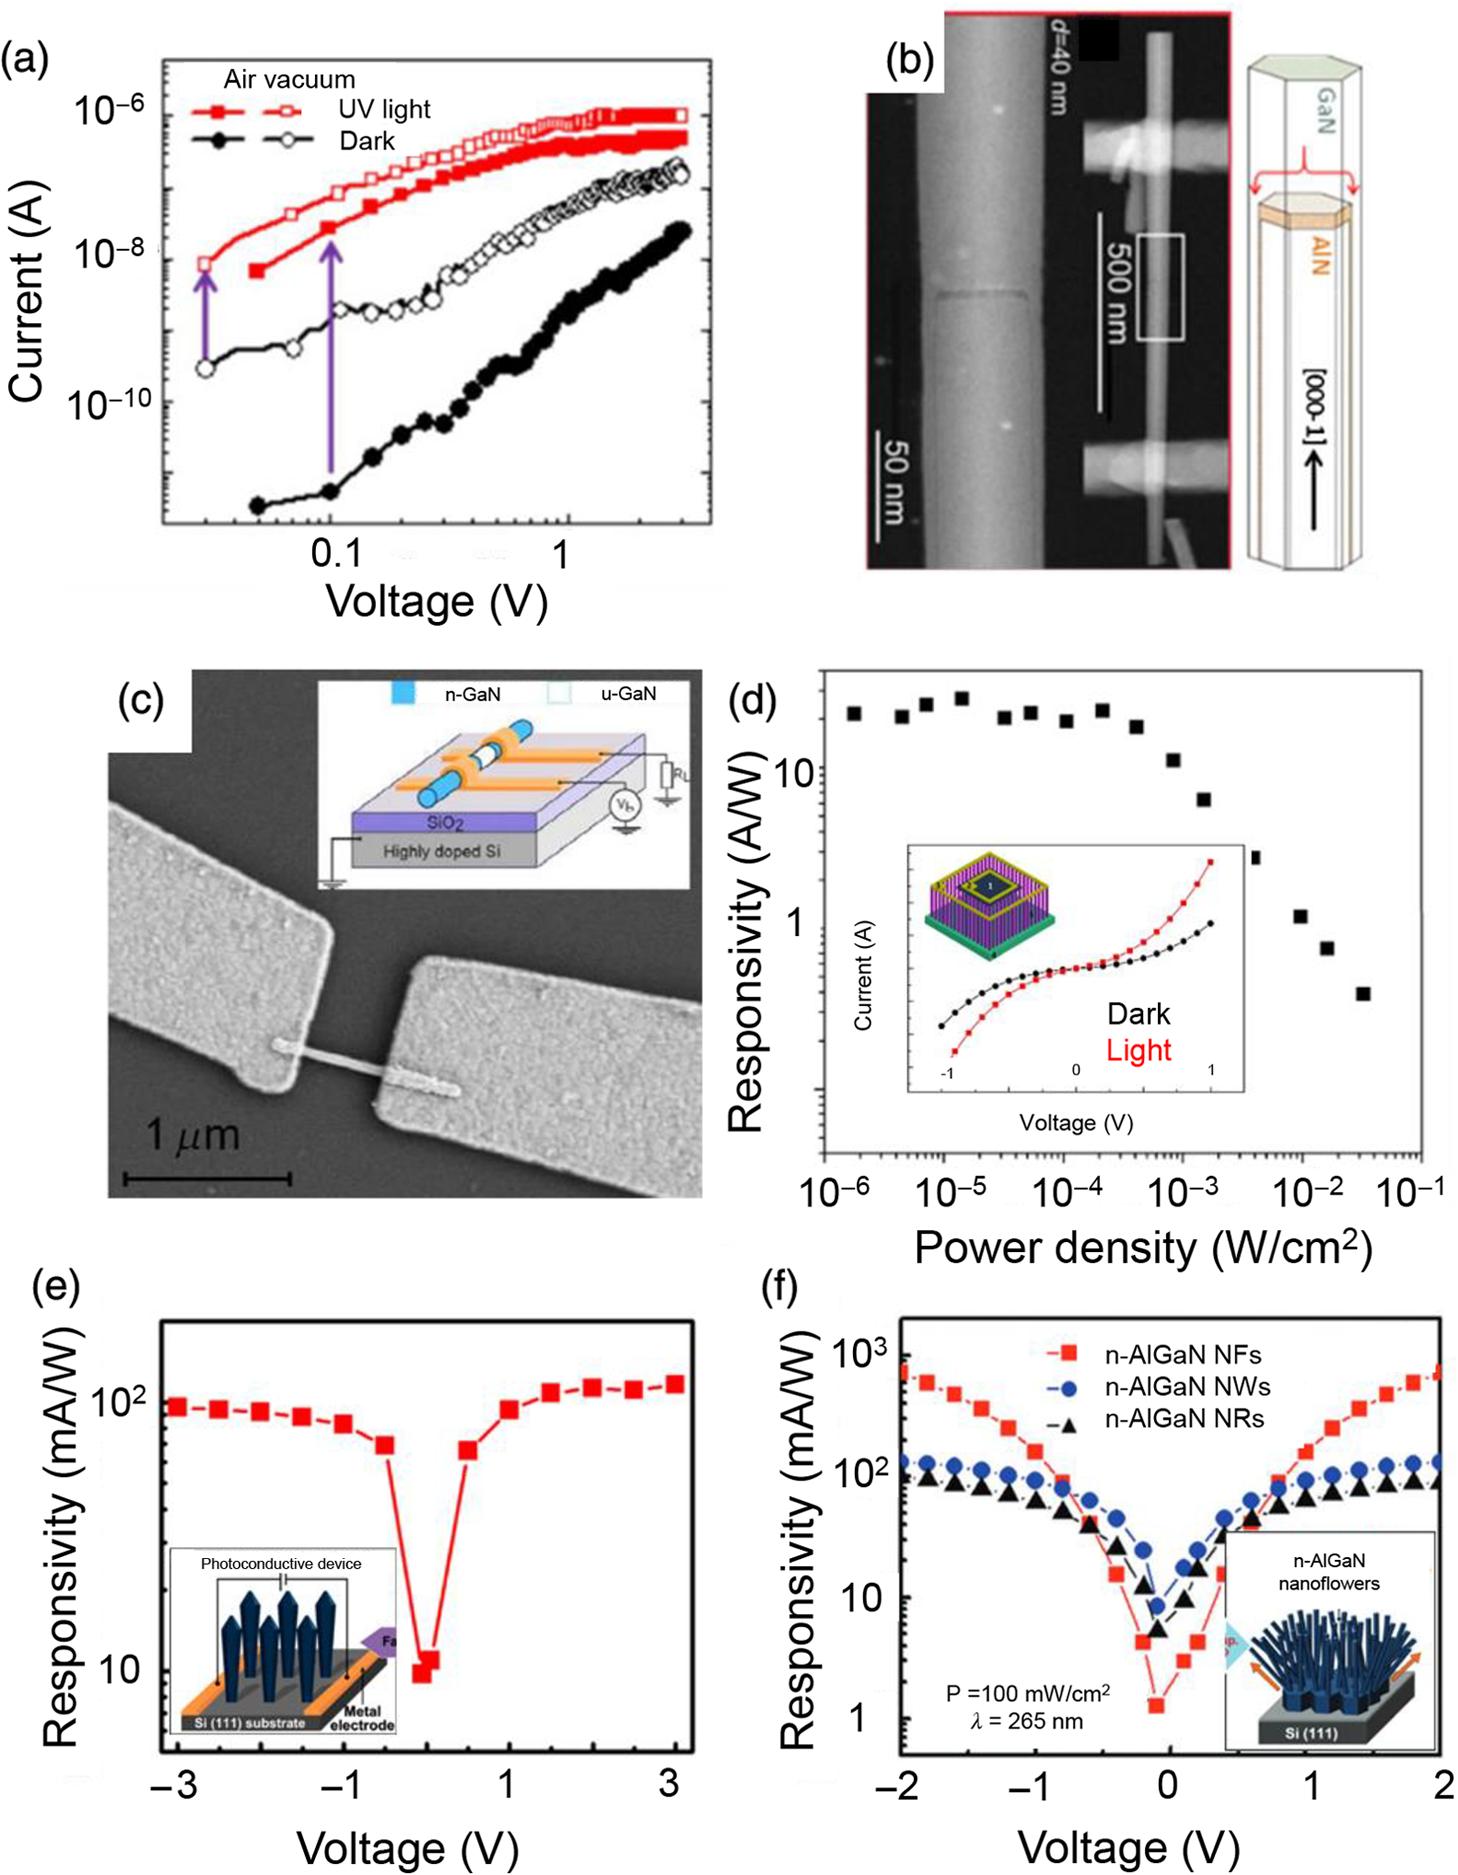 Unleashing The Potential Of Molecular Beam Epitaxy Grown Algan Based 3 Phase Wire Diagram Italian Jnp 12 4 043511 F019